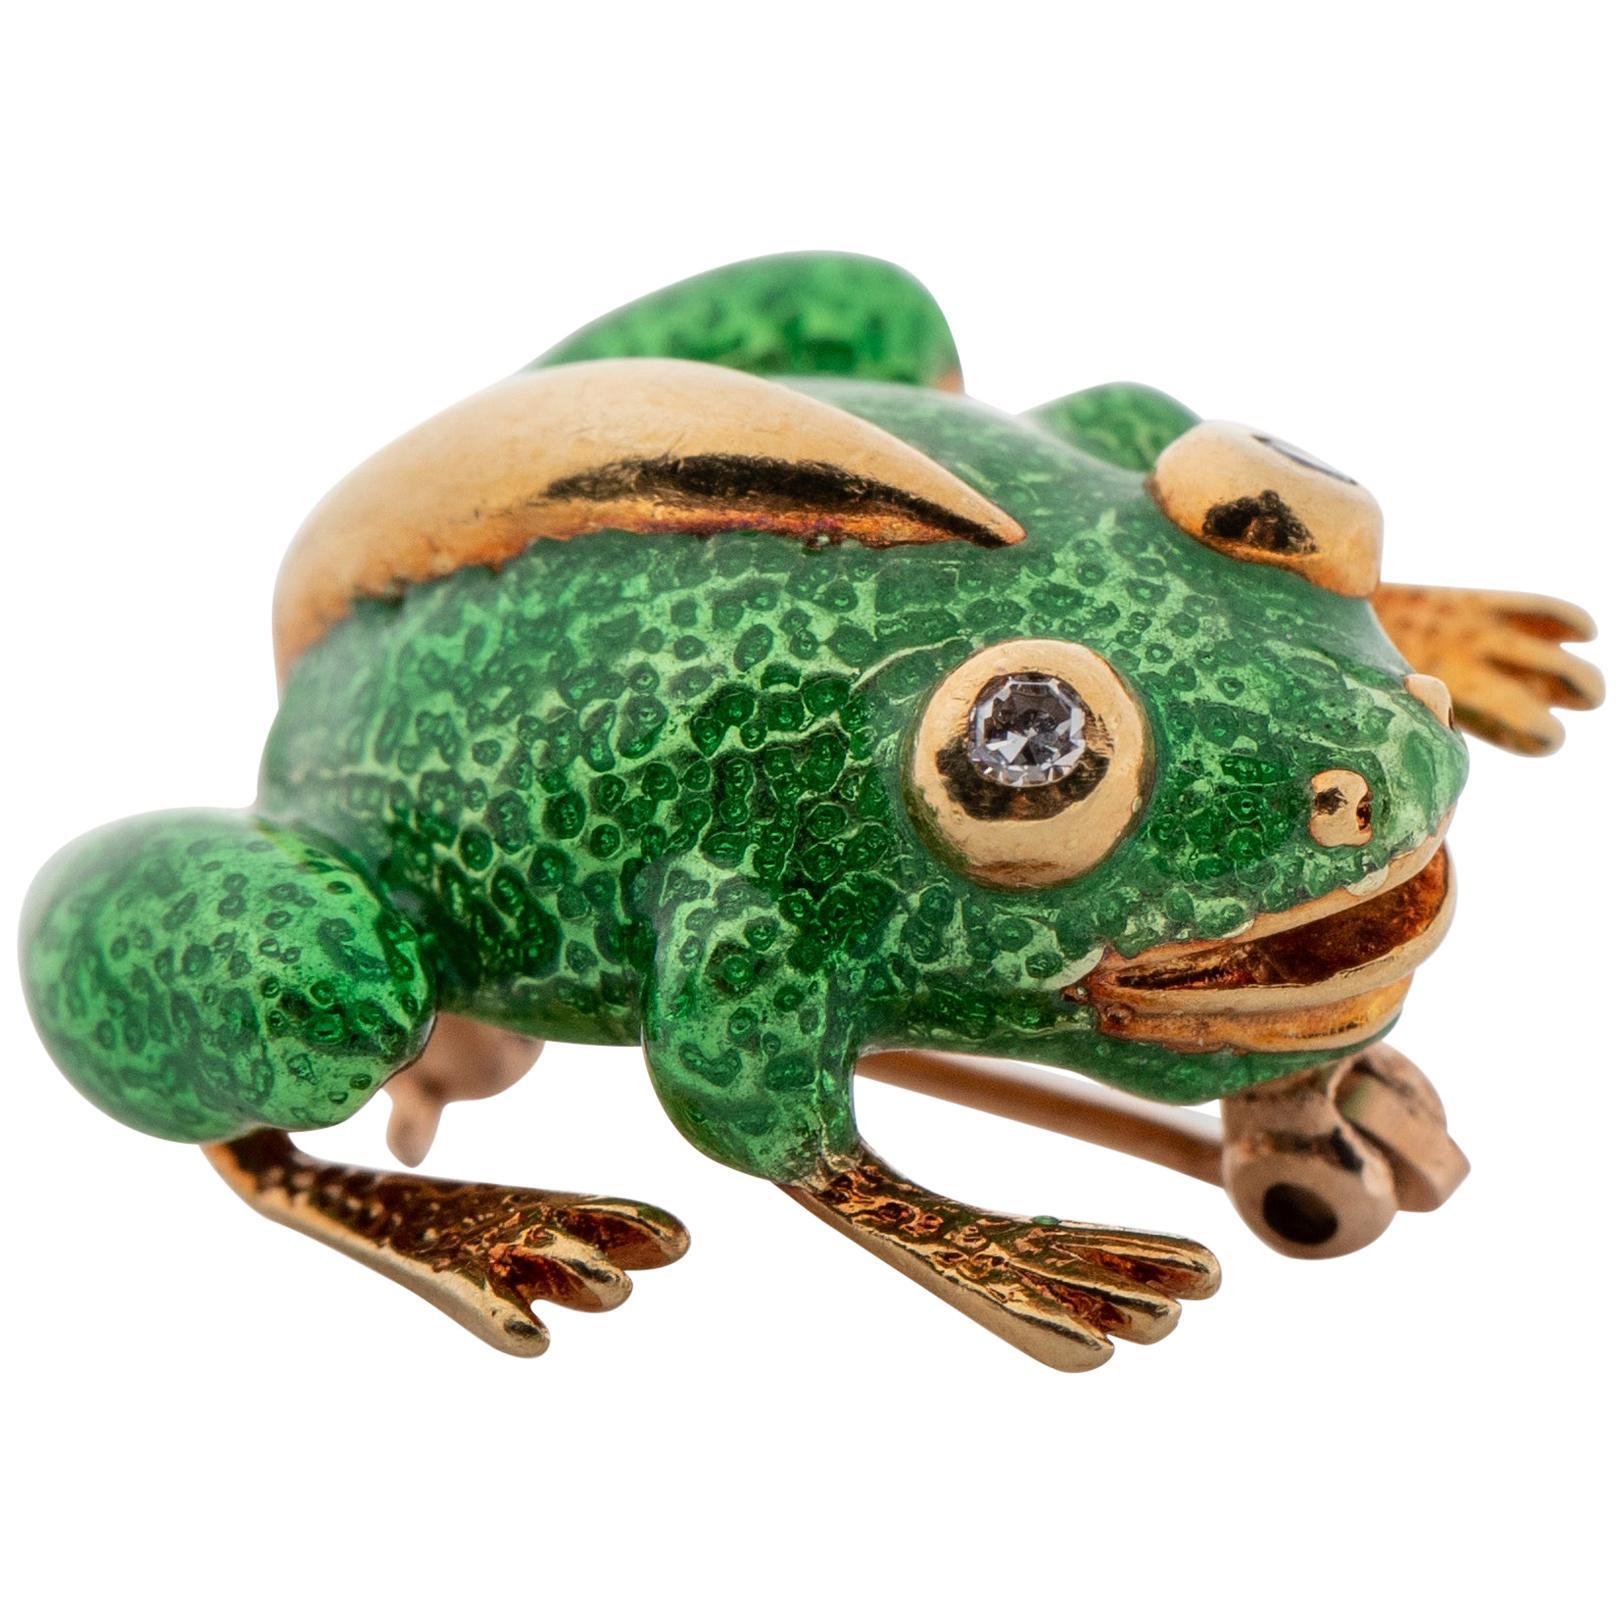 Tiffany & Co. Enamel and Diamond Frog Brooch, 18 Karat Gold